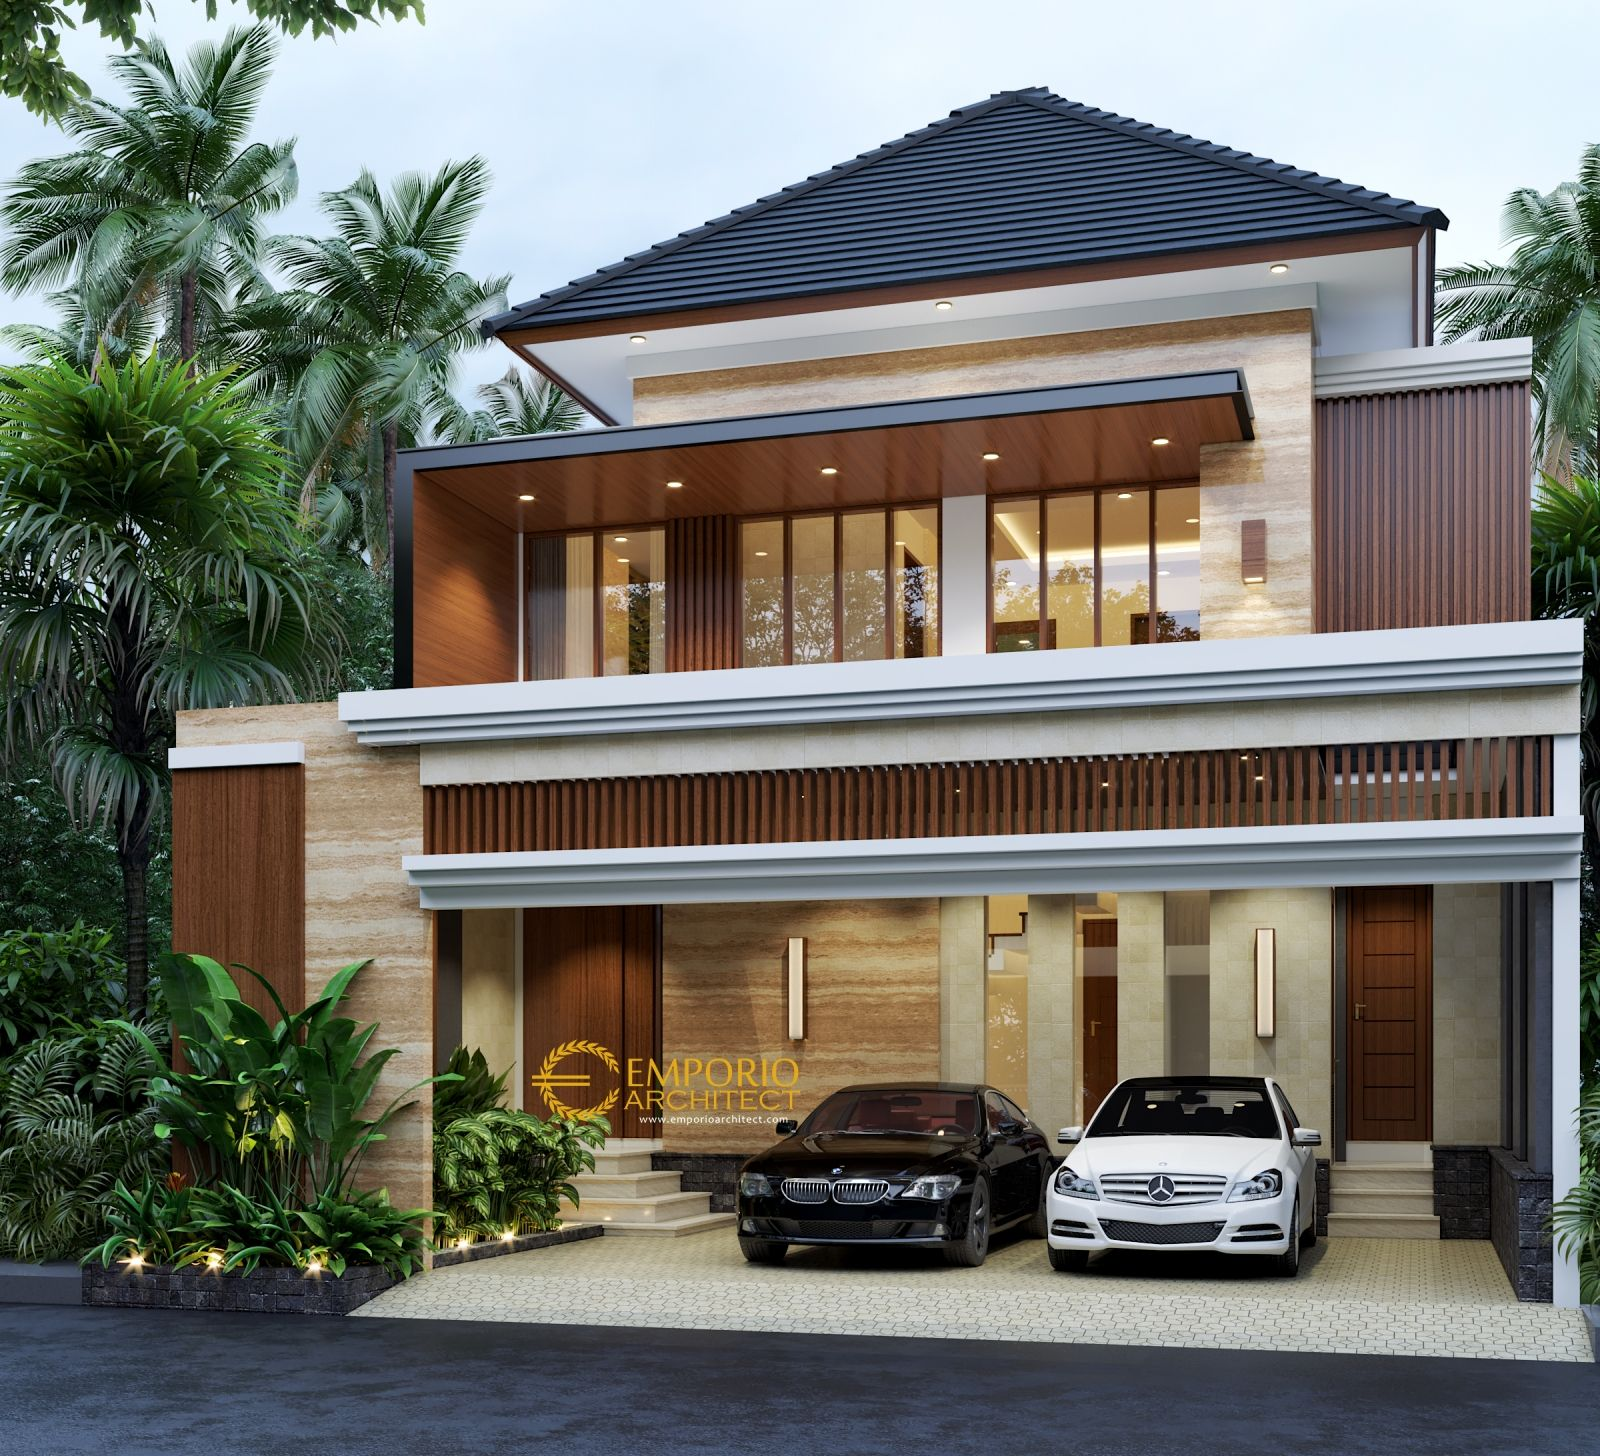 Jasa Arsitek Desain Rumah Berkualitas Desain Villa Bali Modern Tropis Profesional Berpengalaman Dari Emporio Rumah Arsitektur Modern Desain Rumah Arsitektur